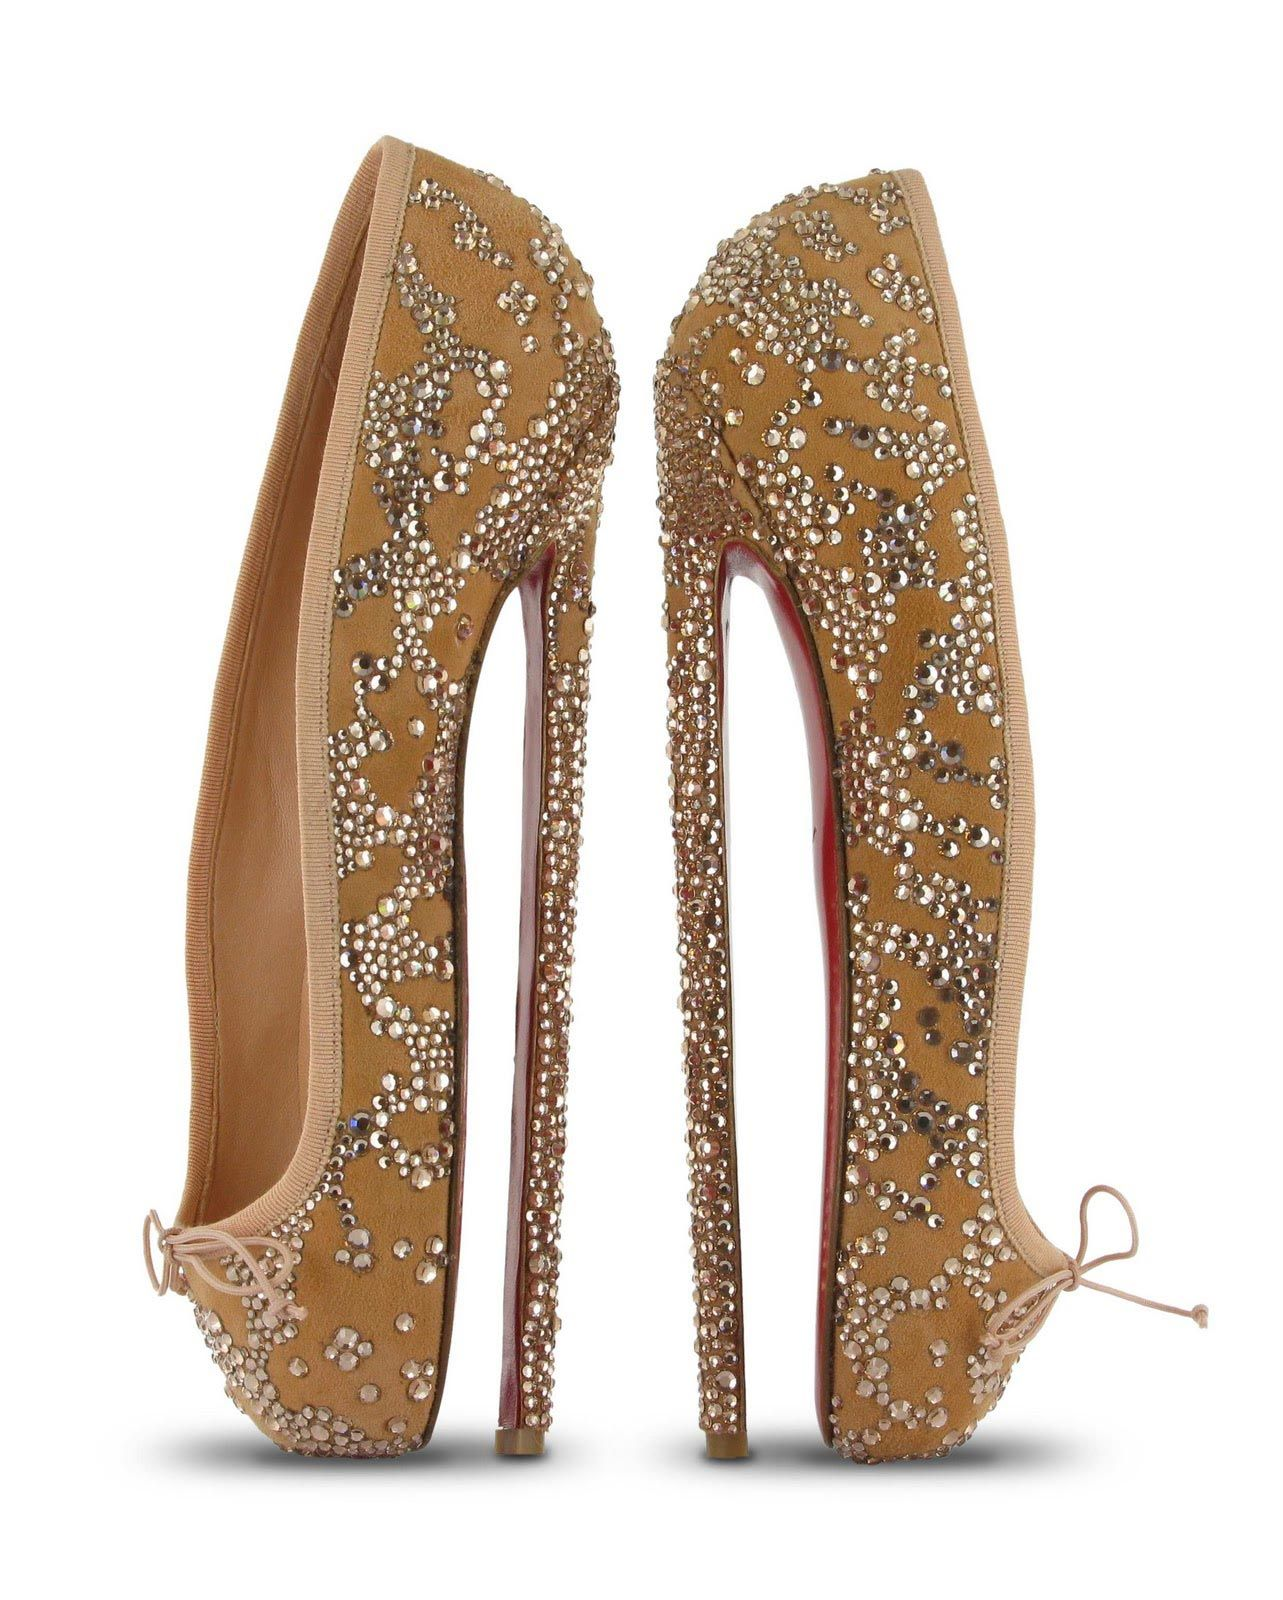 391a04f2d43 Christian Louboutin s Fetish Ballerine - Torturous Shoes - The Cut